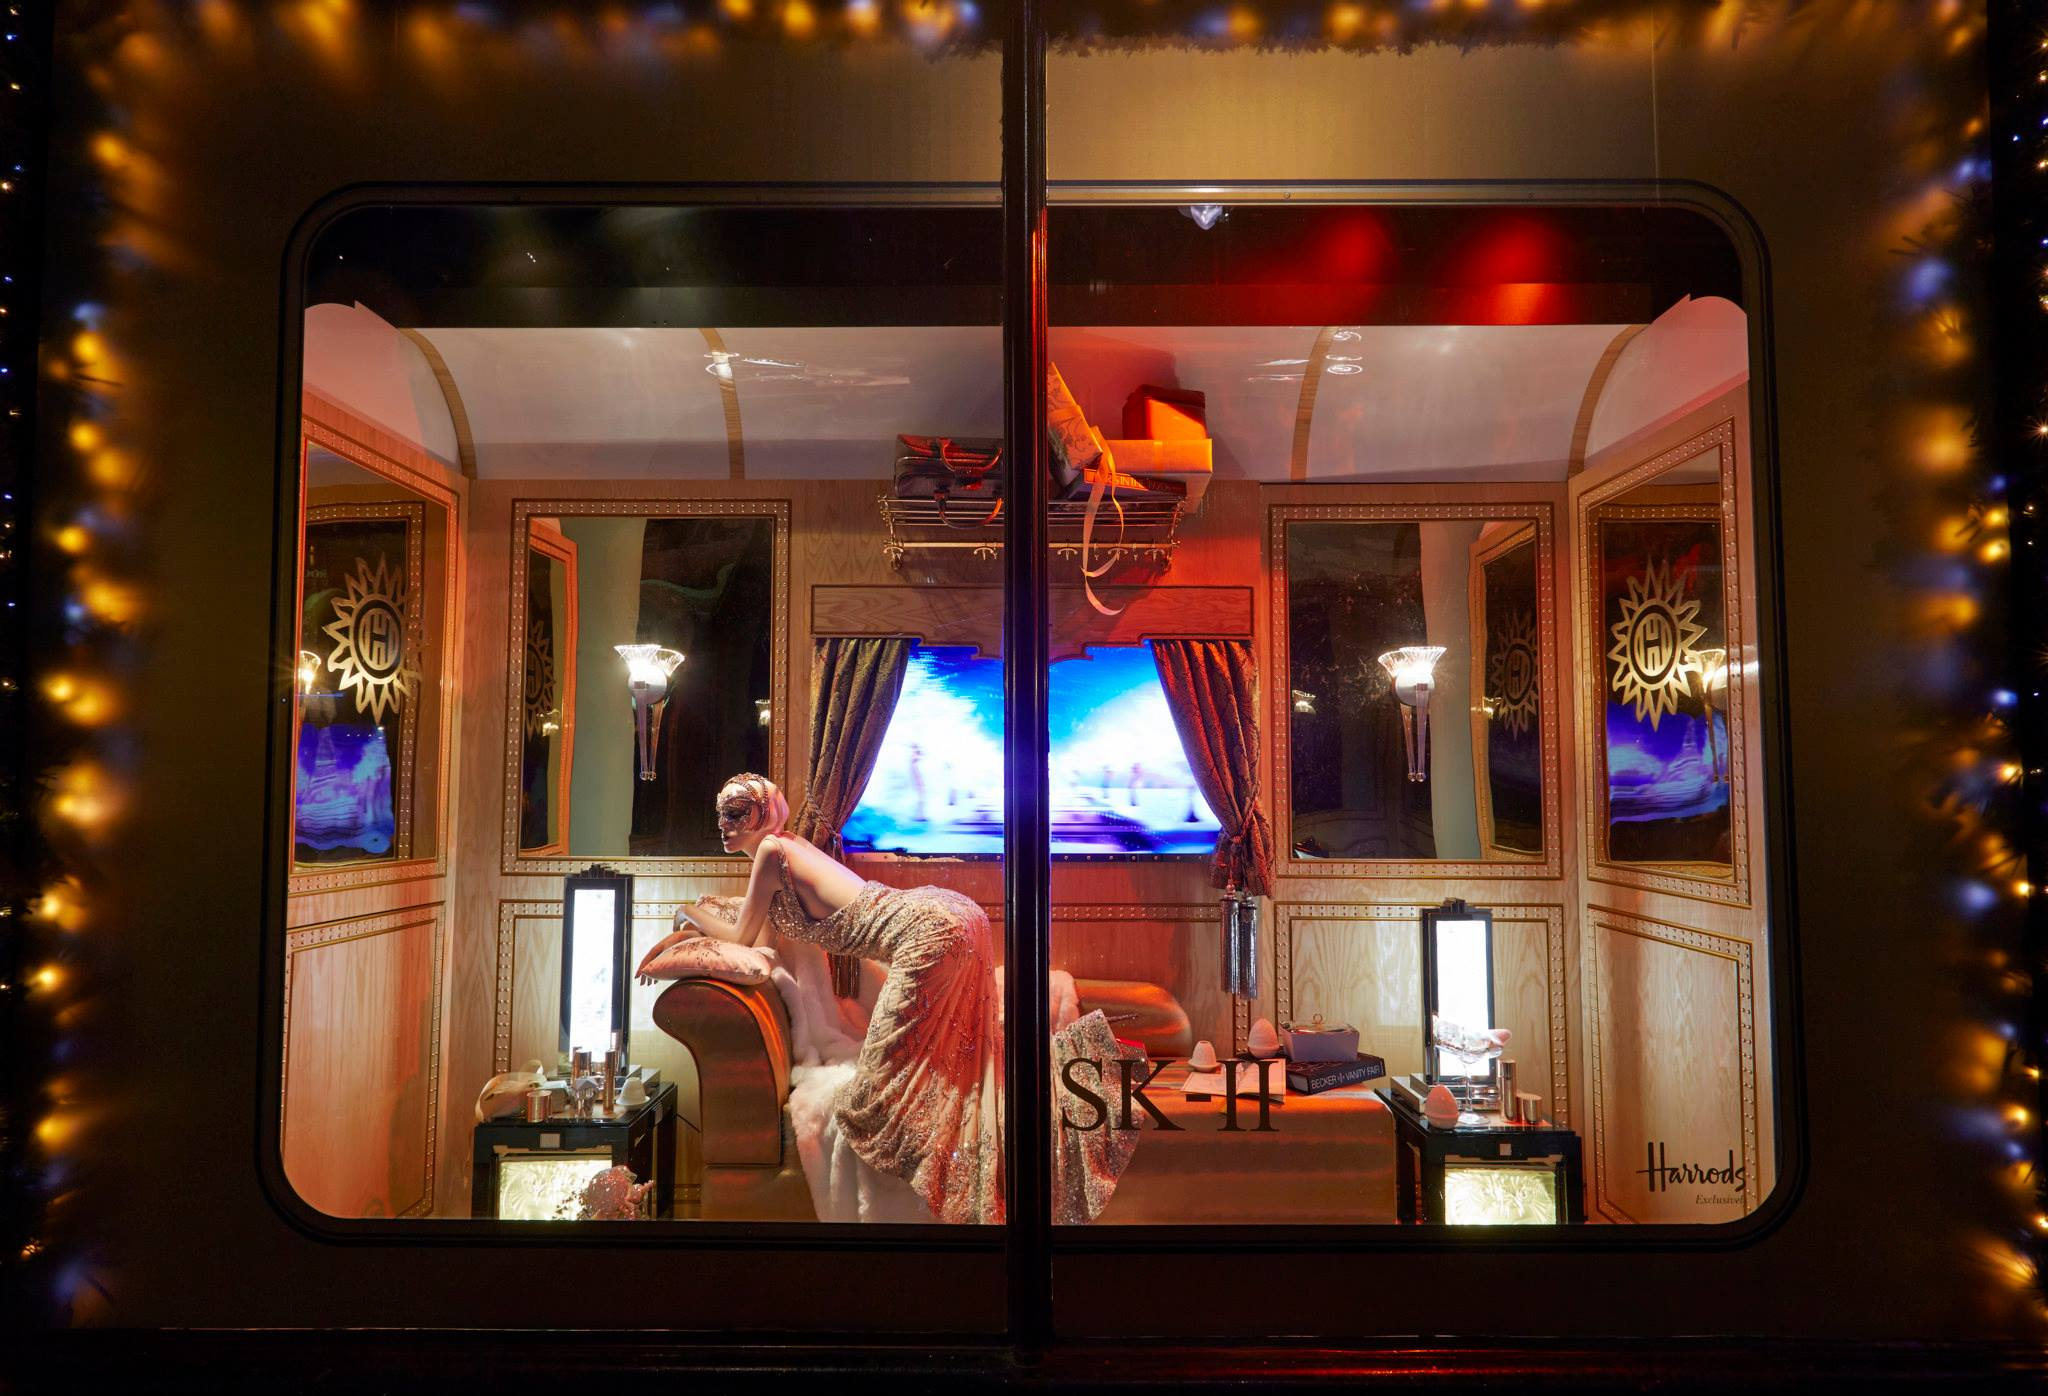 """The Harrods Express"" Christmas Window Display 2013 - Best ..."